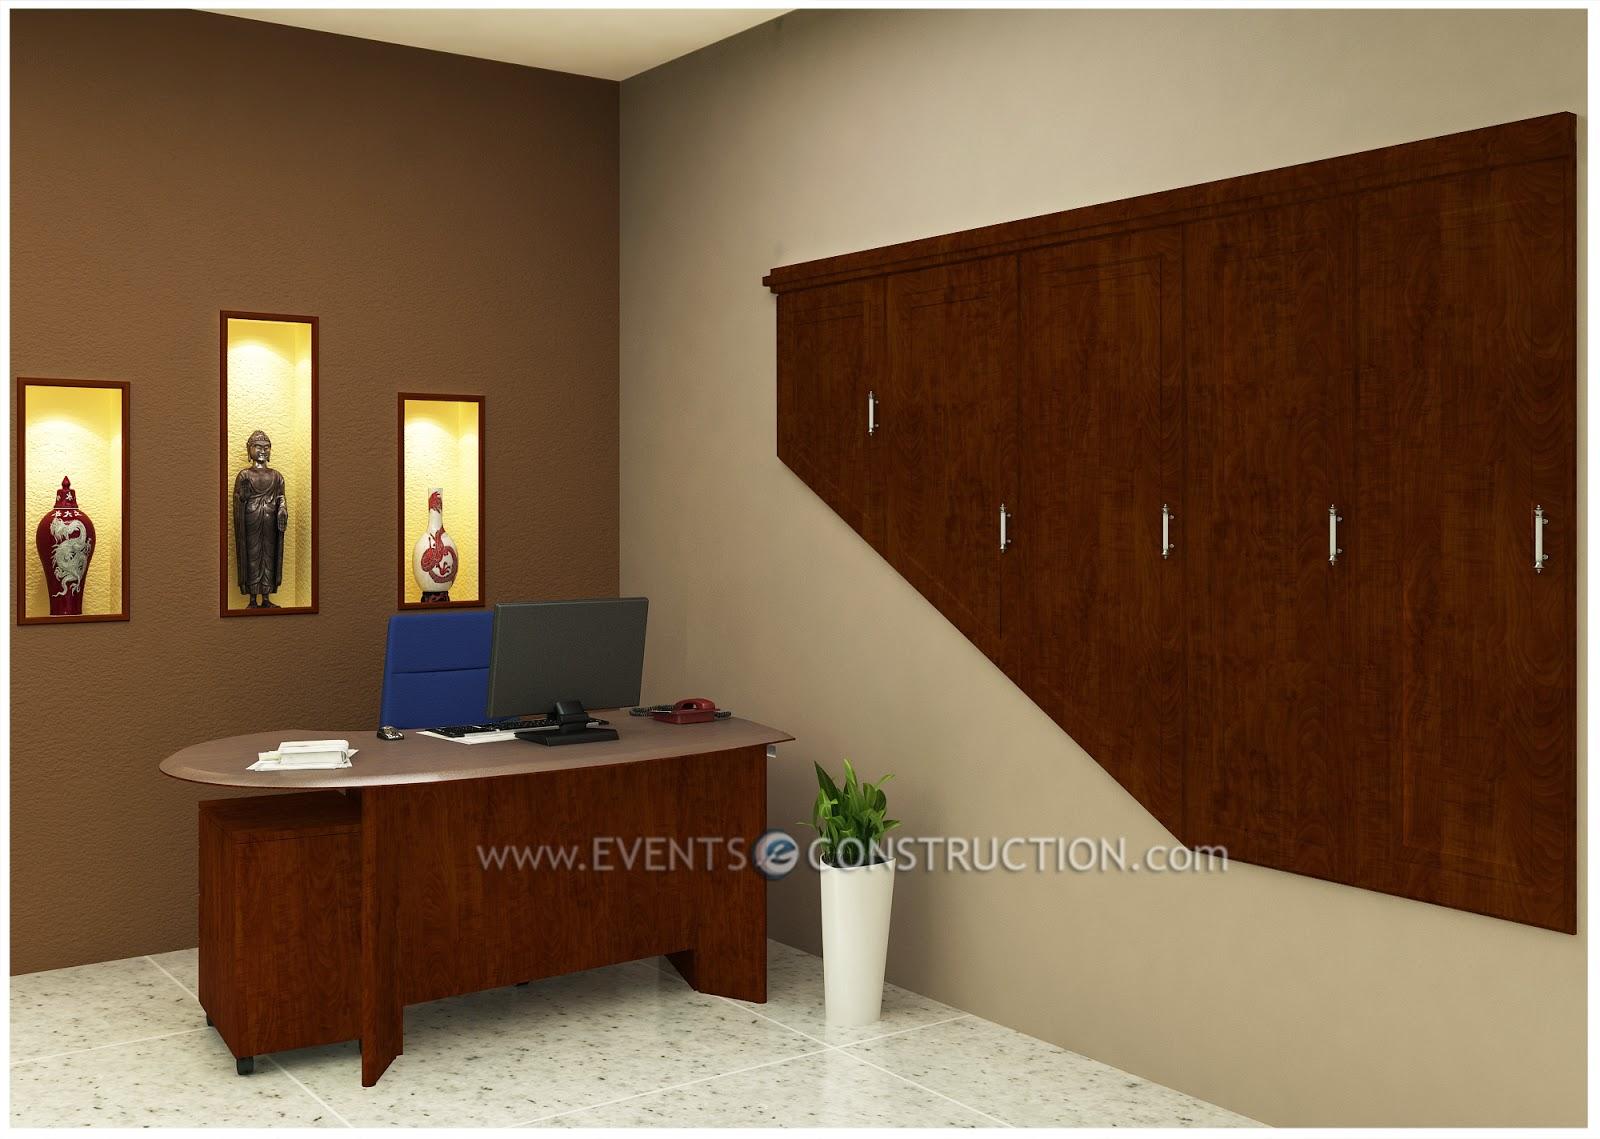 Evens construction pvt ltd simple home office designs for Home office design ltd